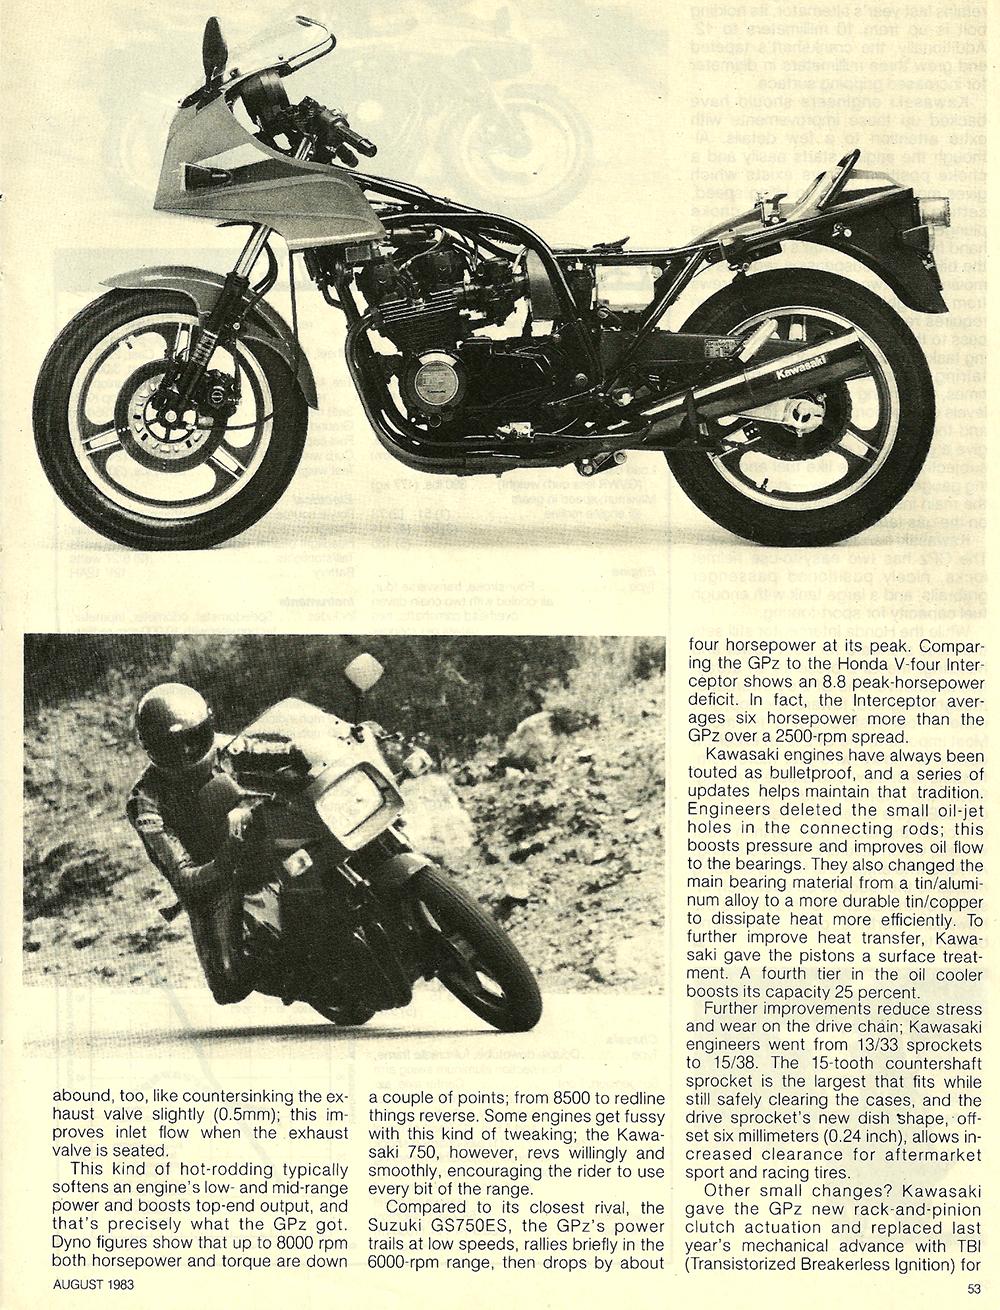 1983 Kawasaki GPz 750 road test 6.jpg